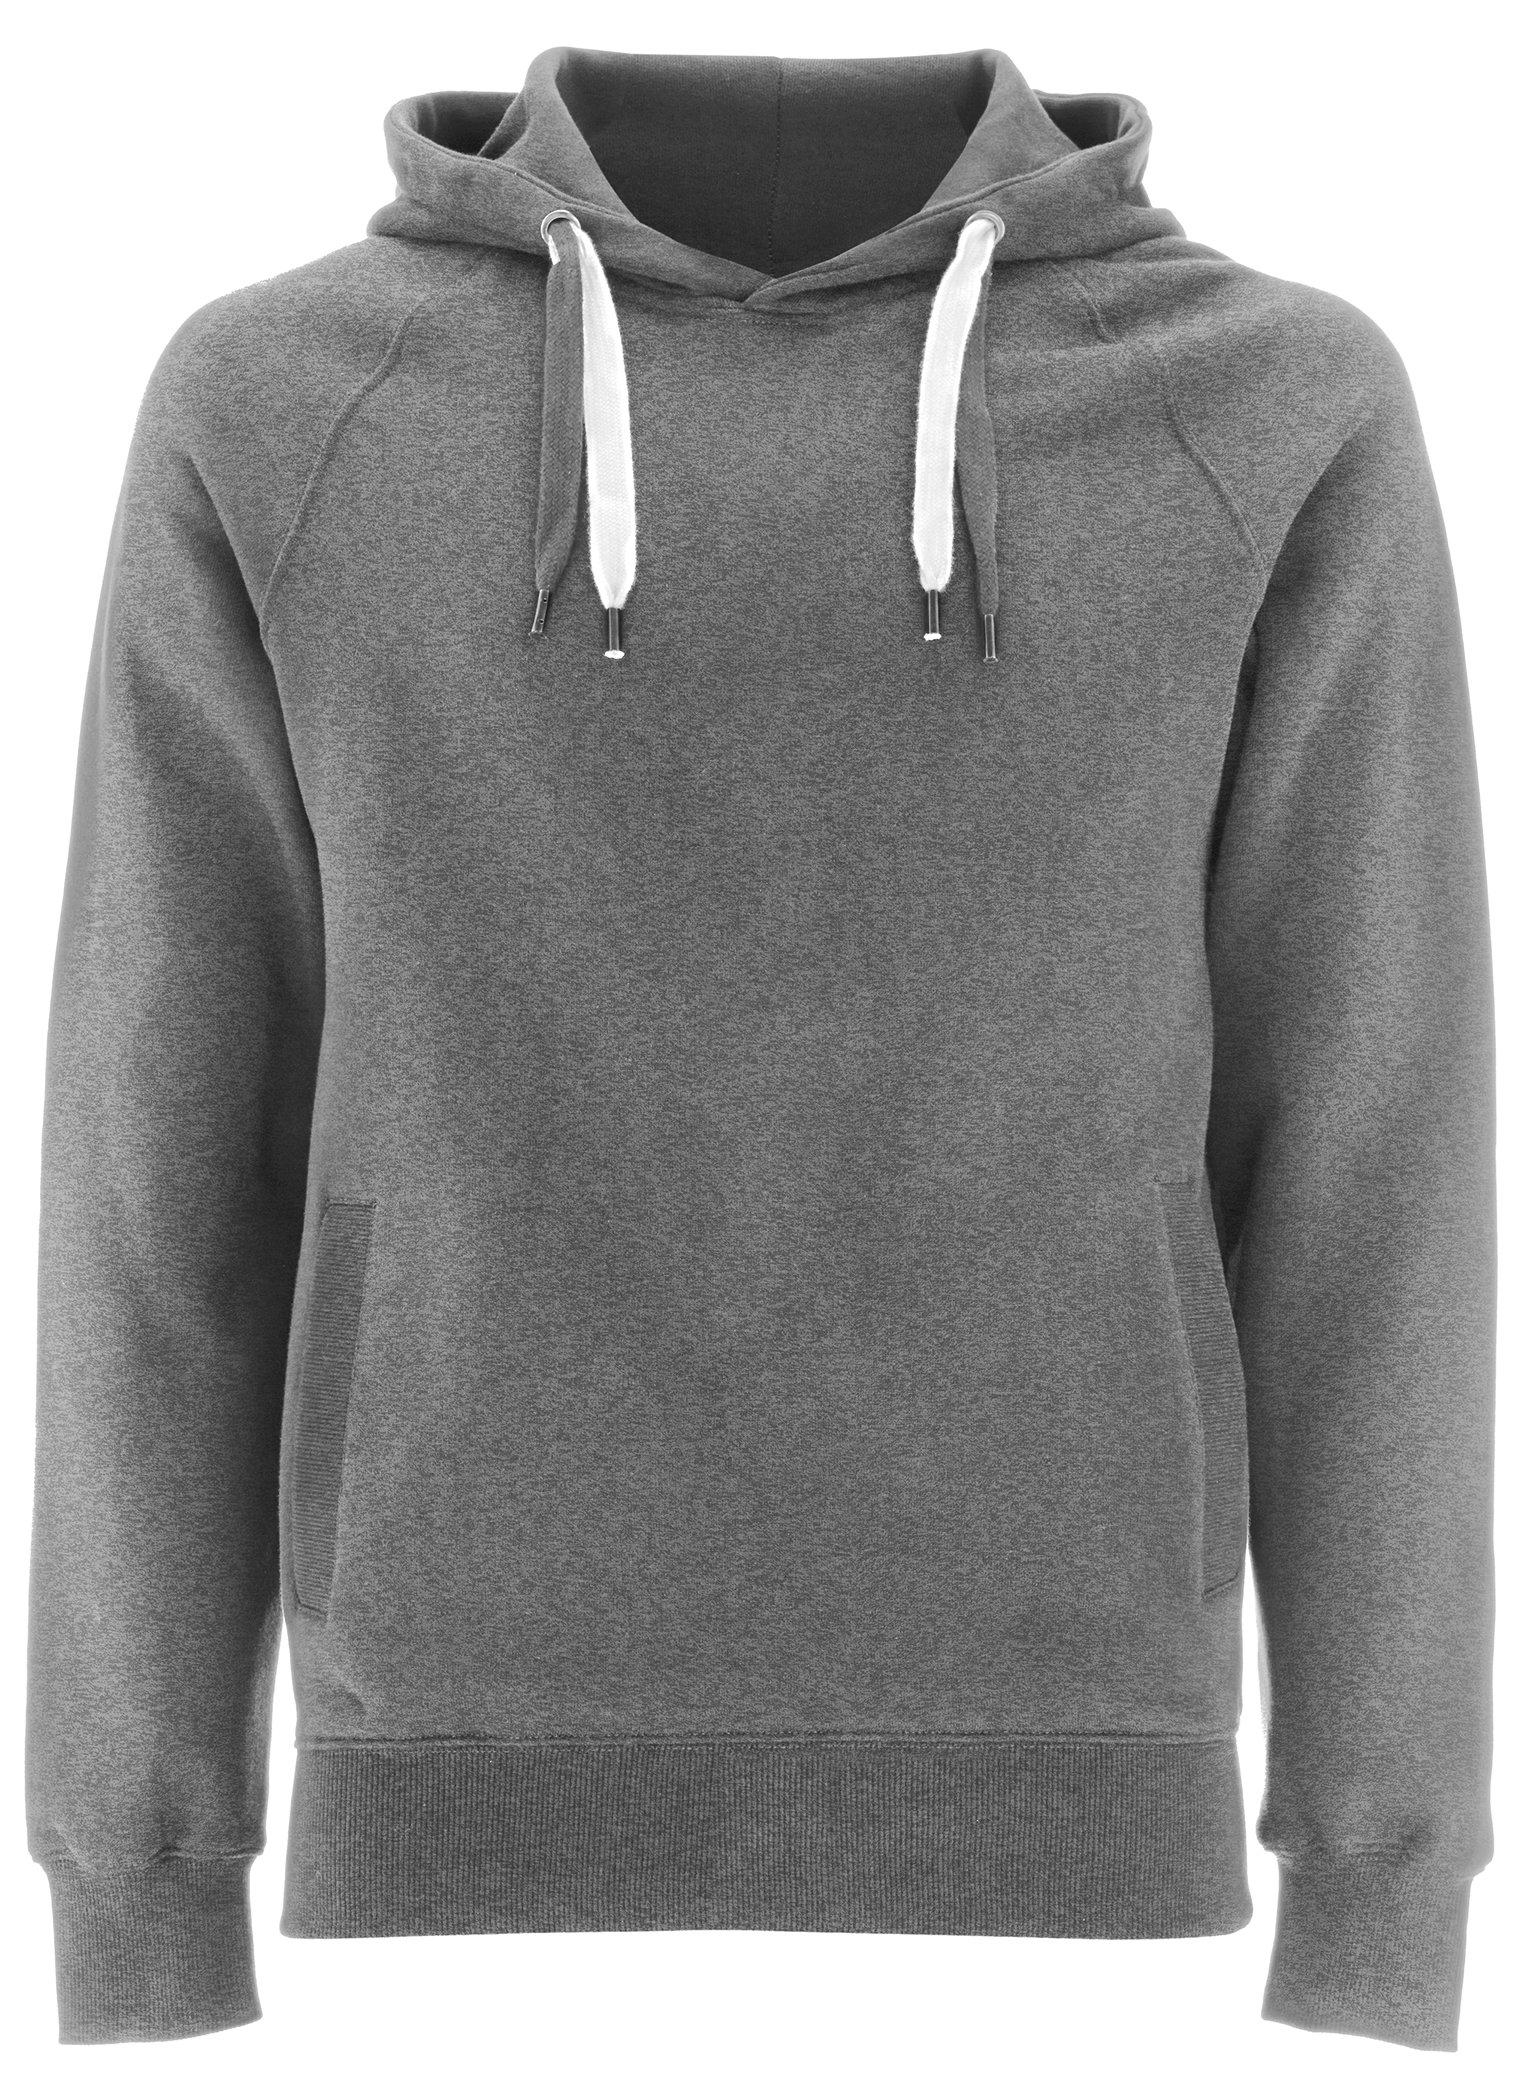 Melange Grey Pullover Hoodie for Girls - X Small - XS - Girls Hooded Sweatshirt